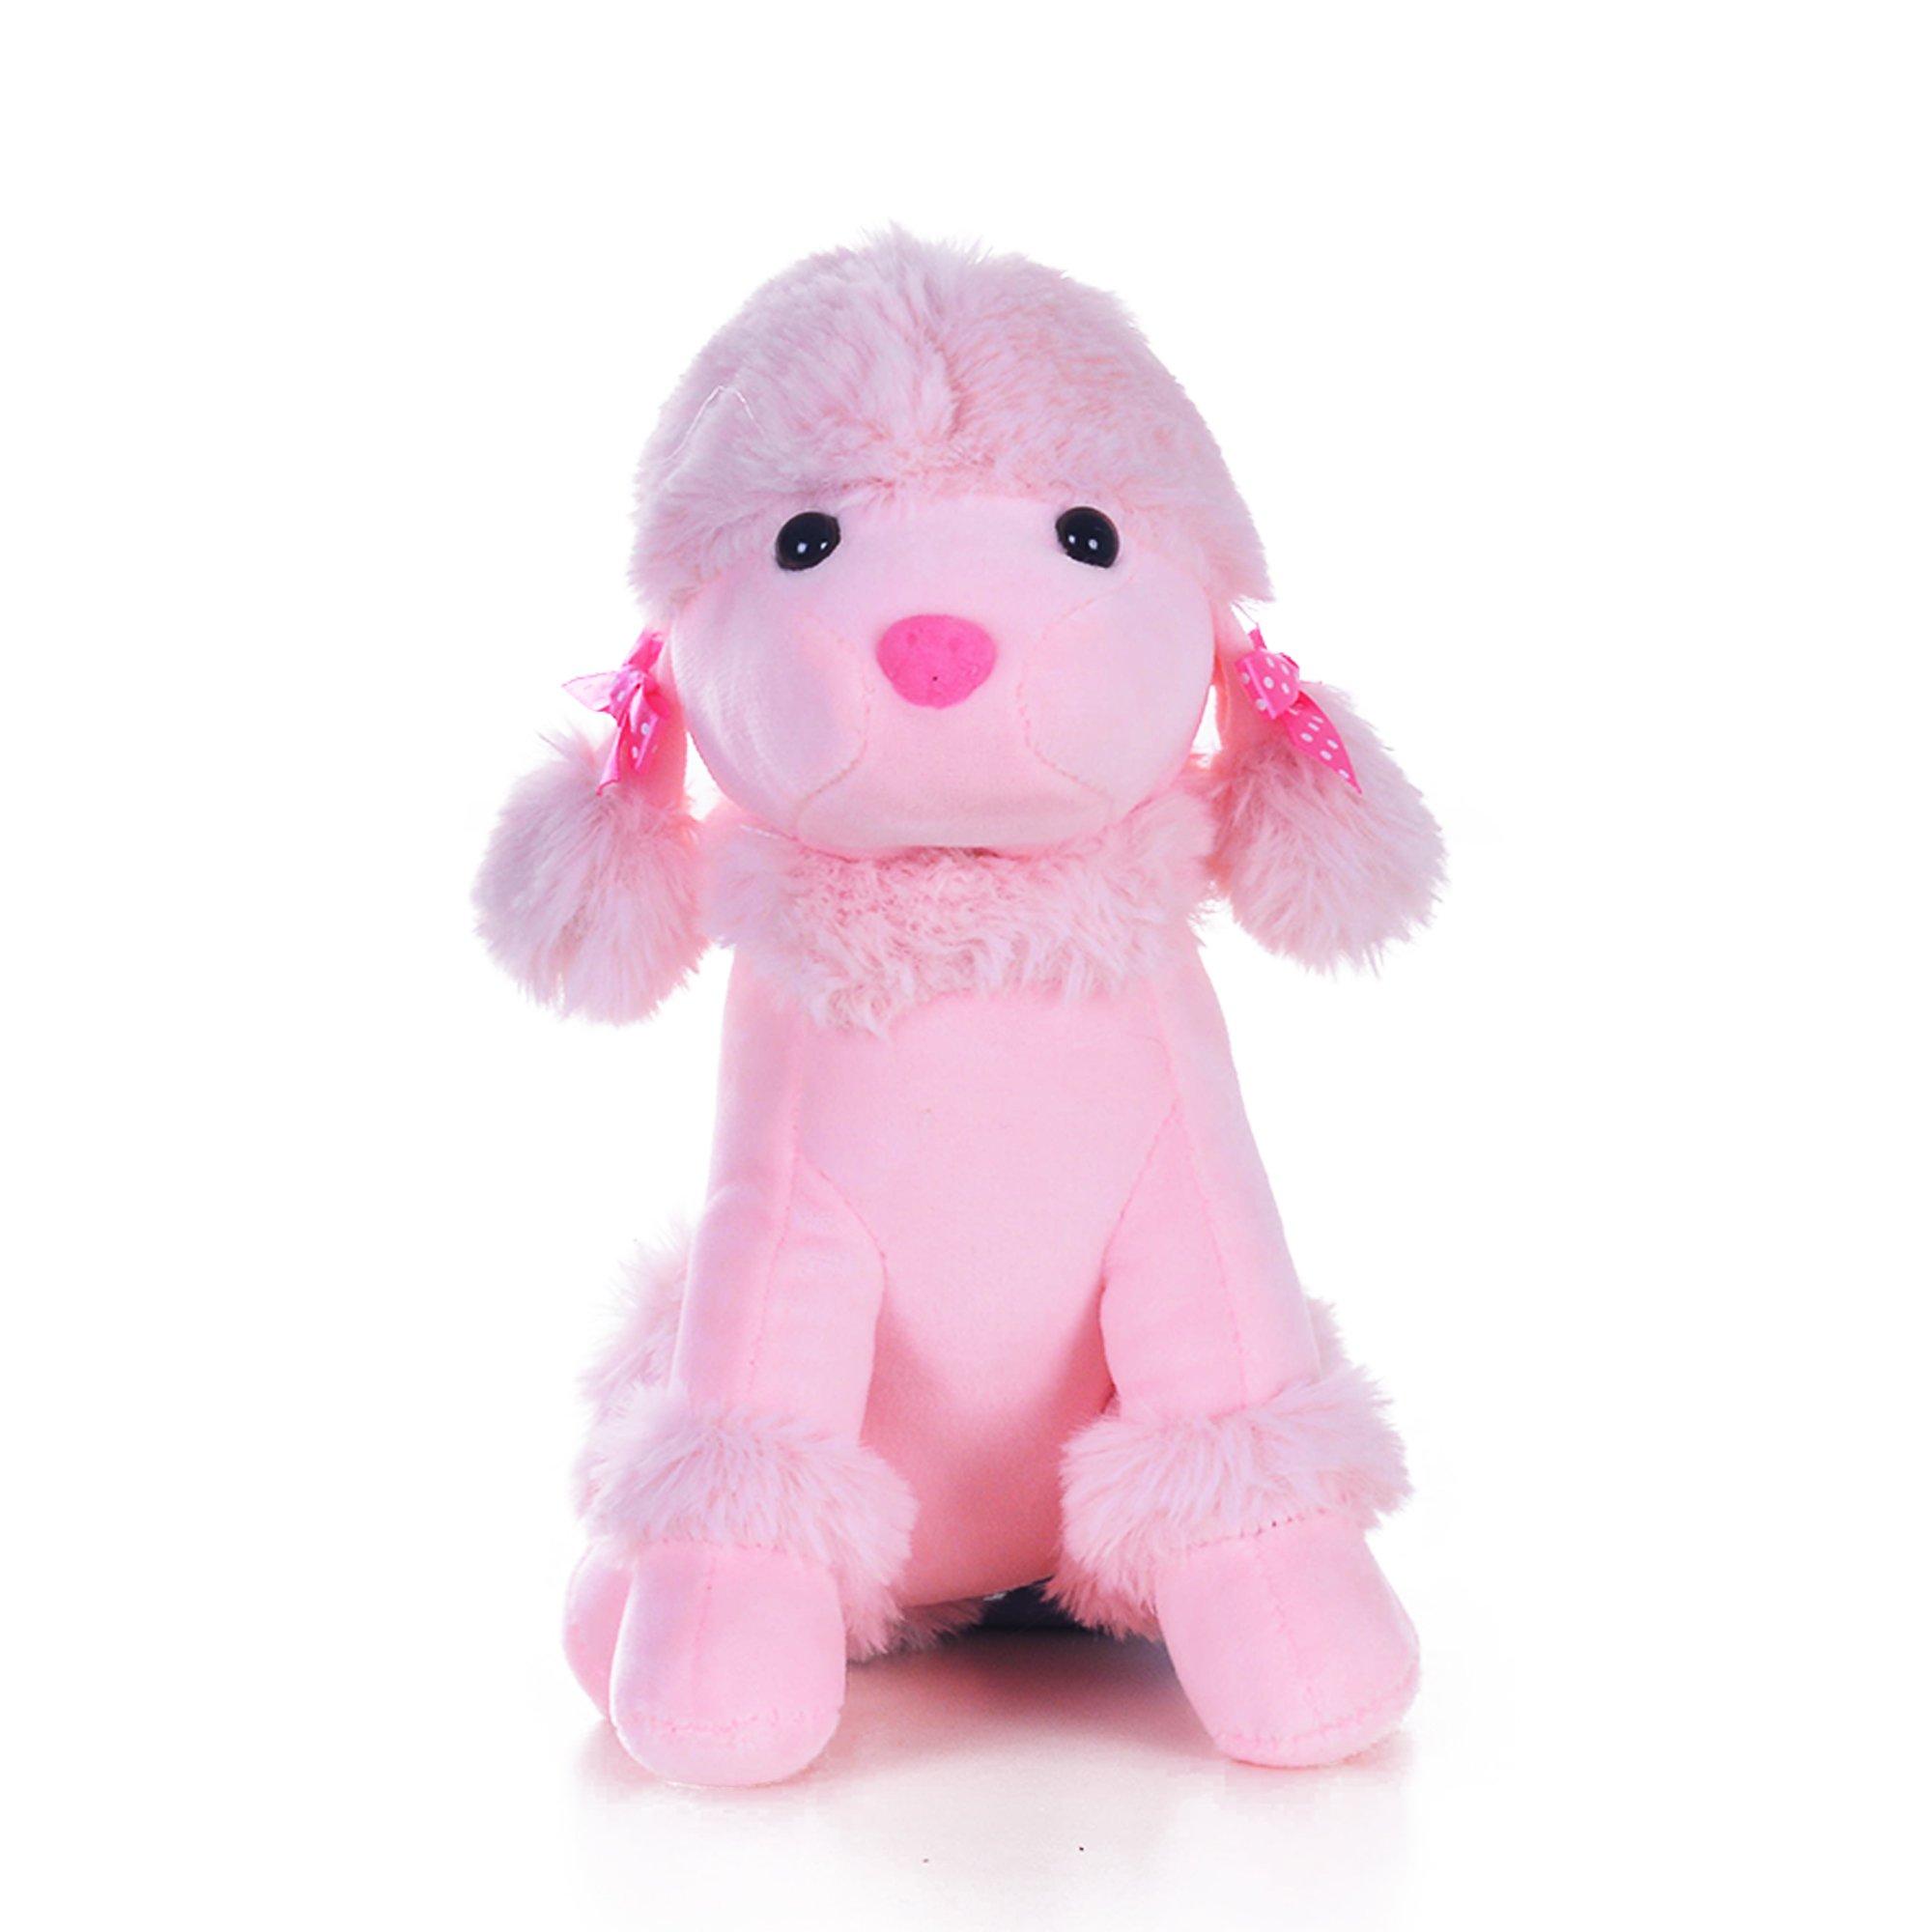 Cheap Pink Dog Stuffed Animal Find Pink Dog Stuffed Animal Deals On